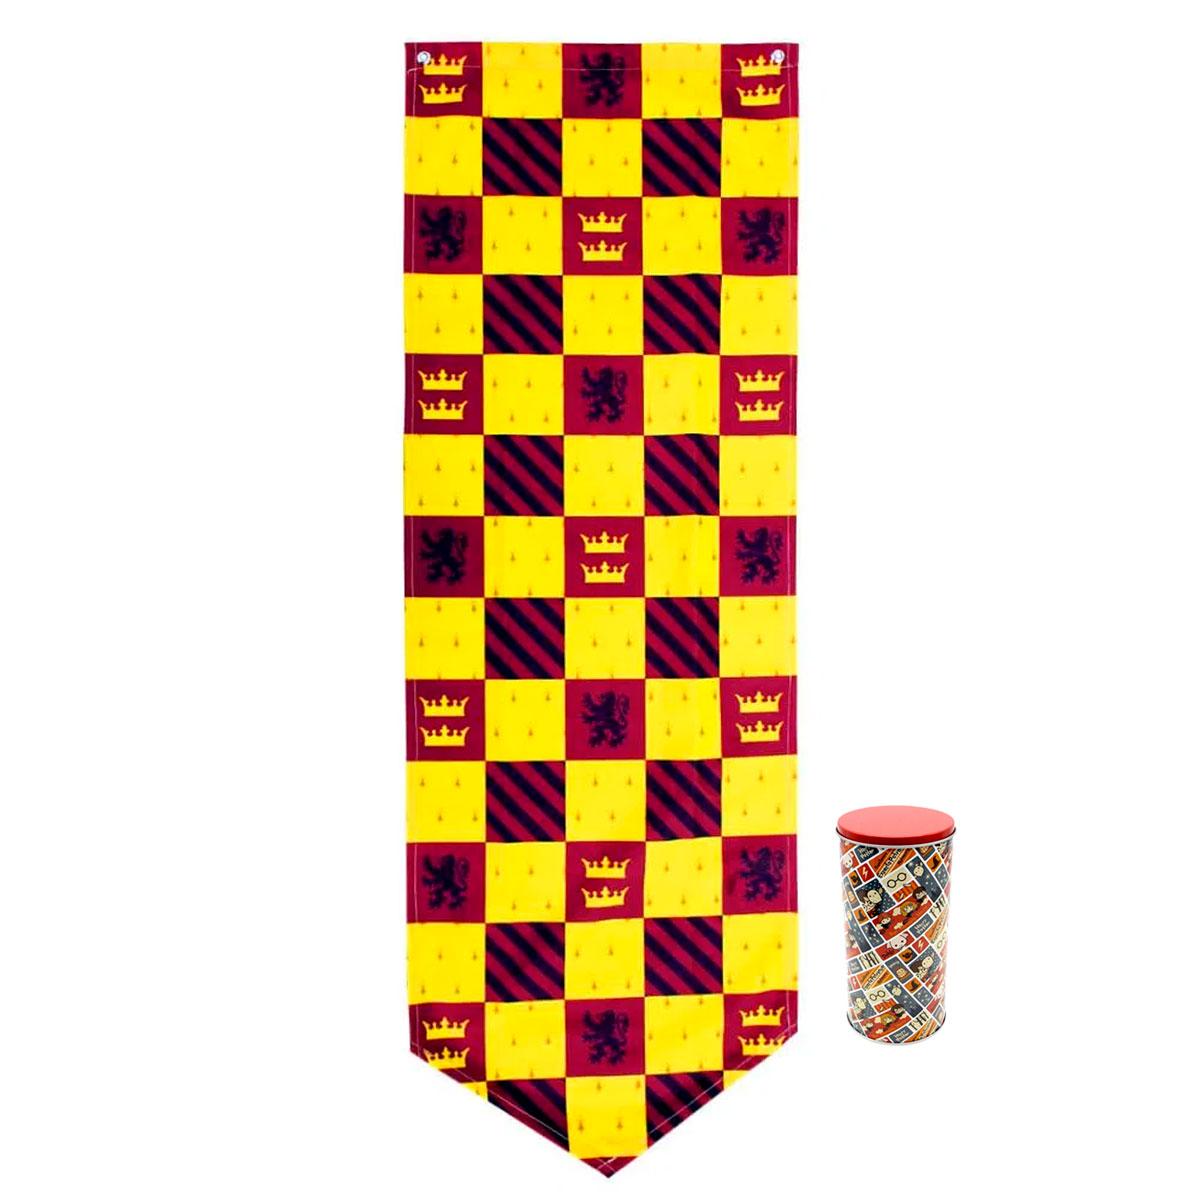 Flamula Decorativa Harry Potter Grifinoria - Presente Super